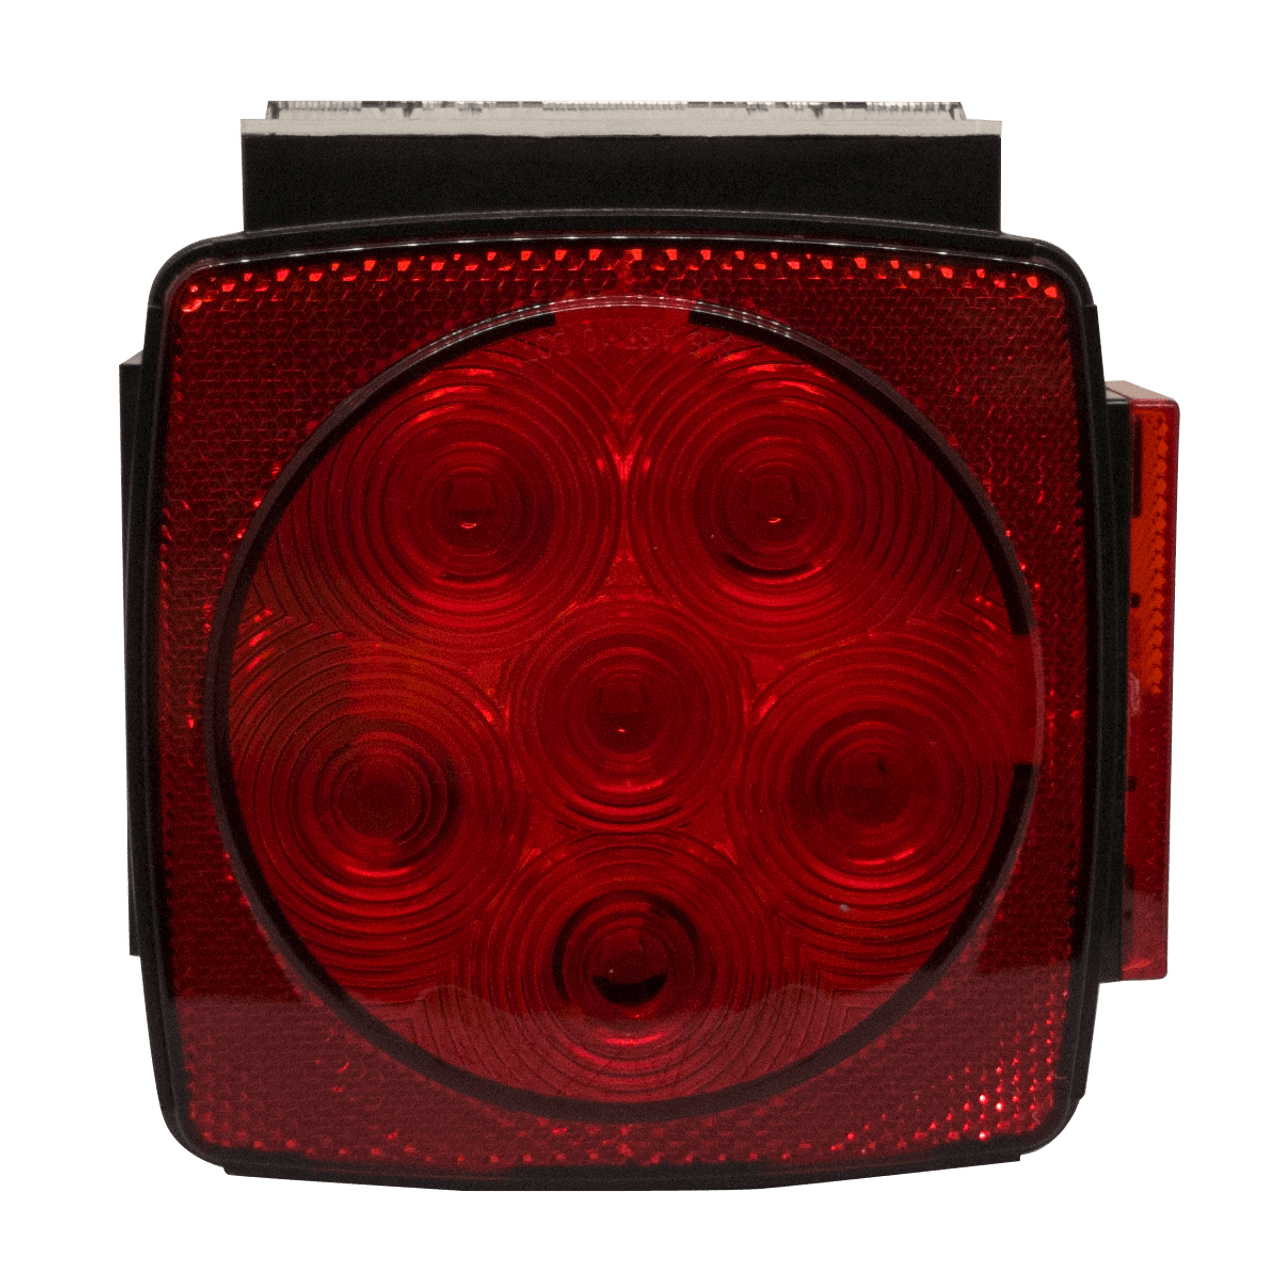 LED540 --- Submersible LED Trailer Light Kit